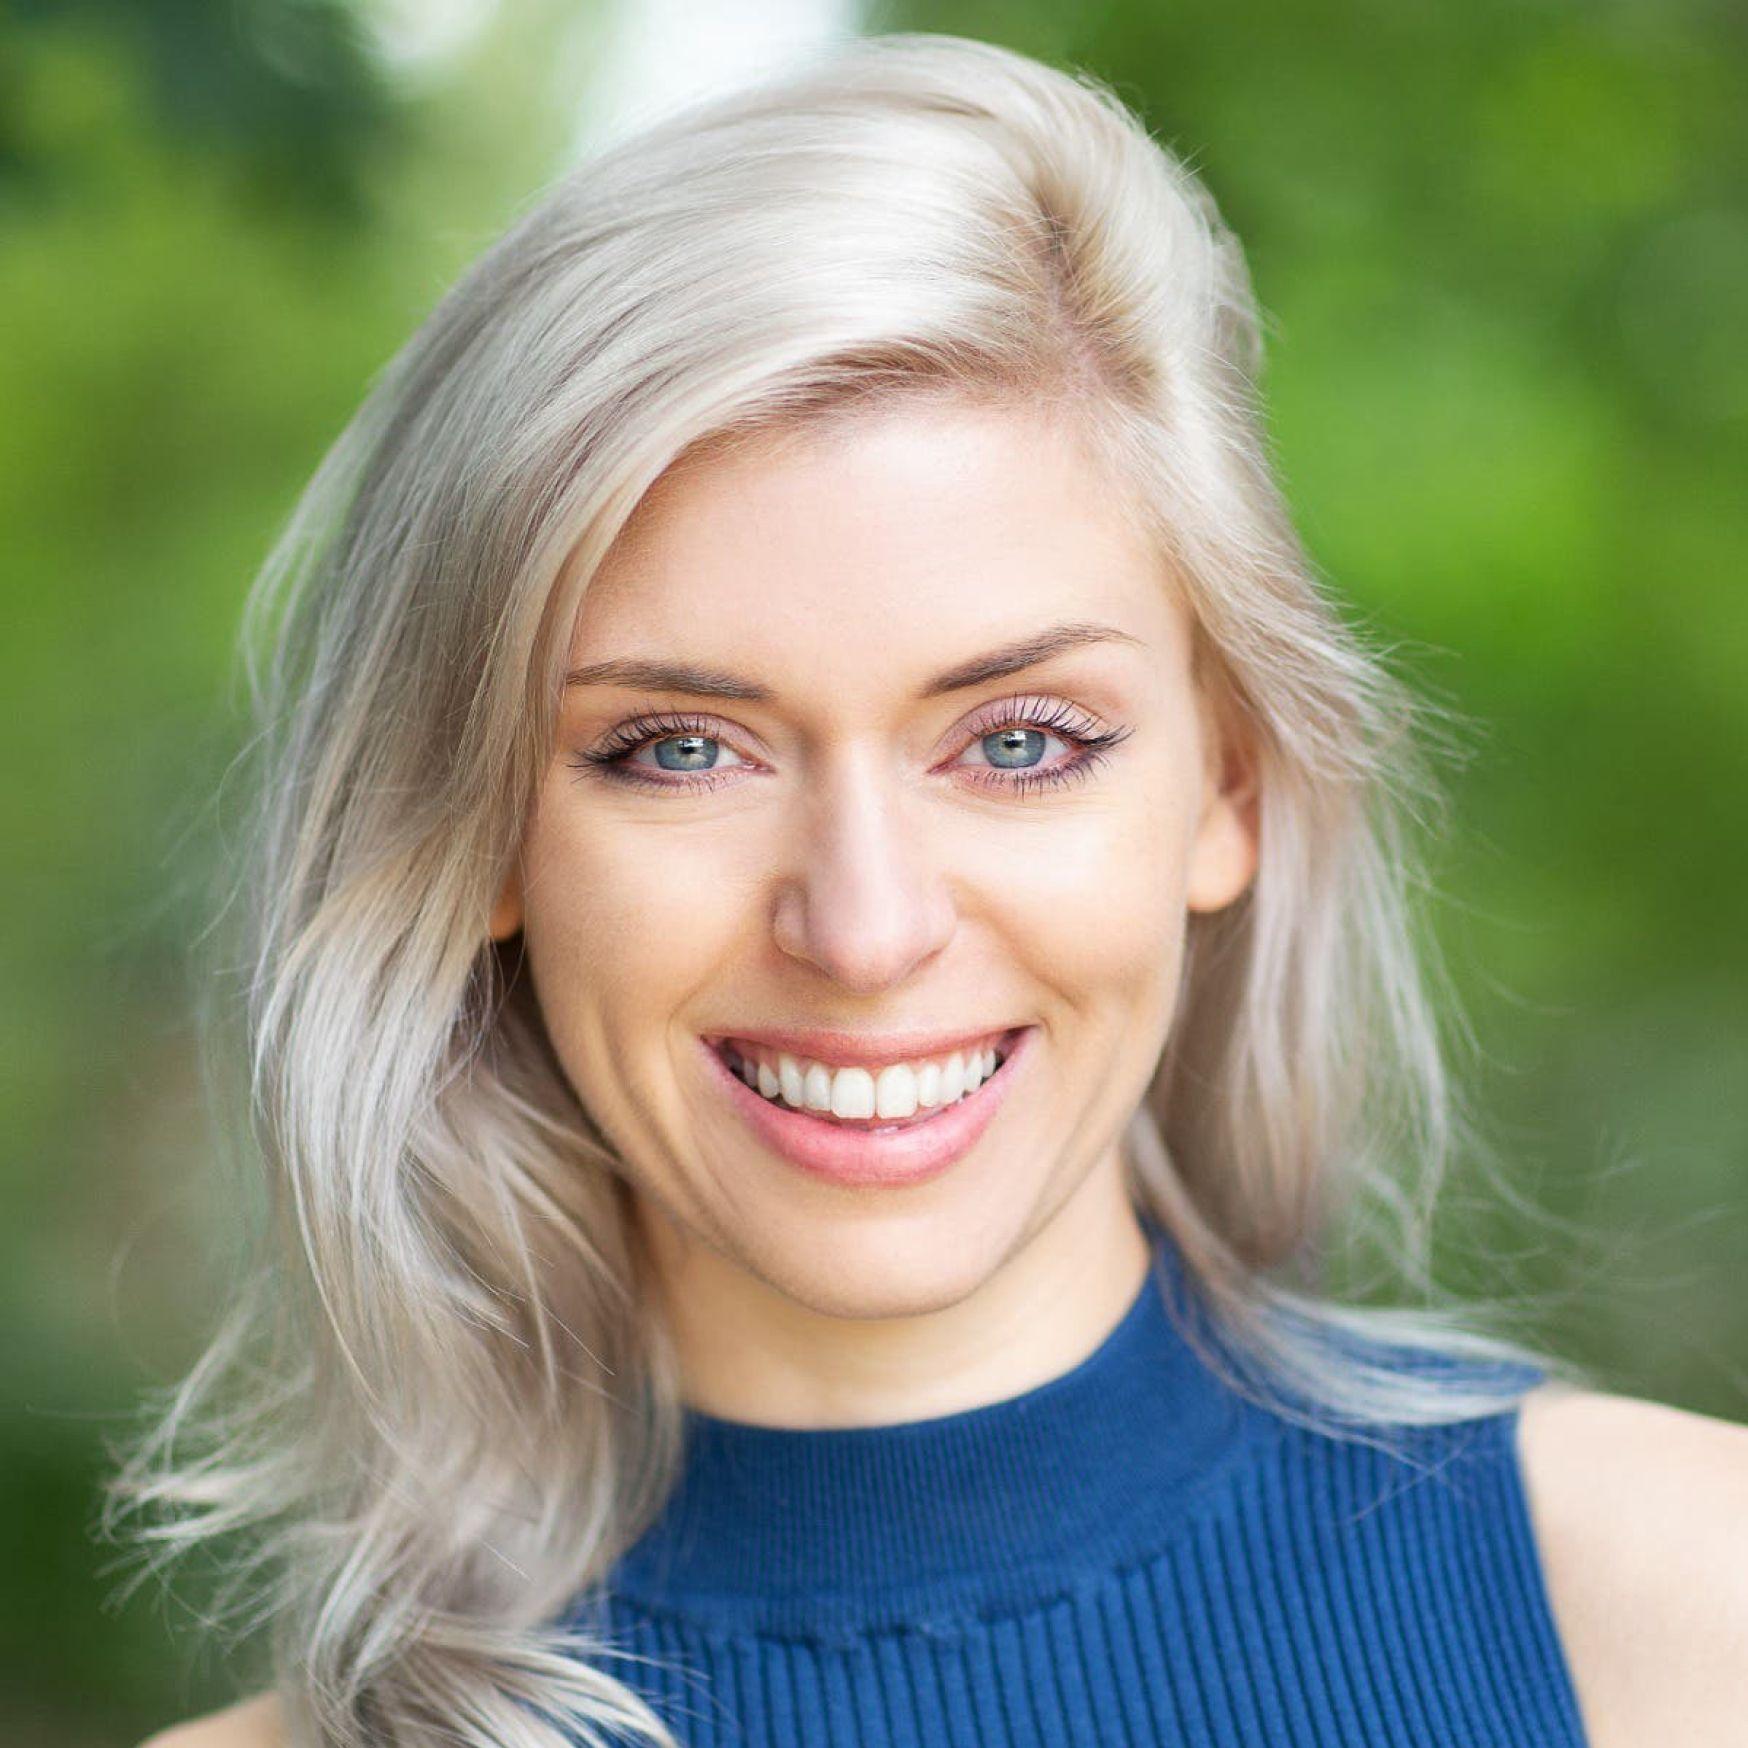 Jessica Matzig